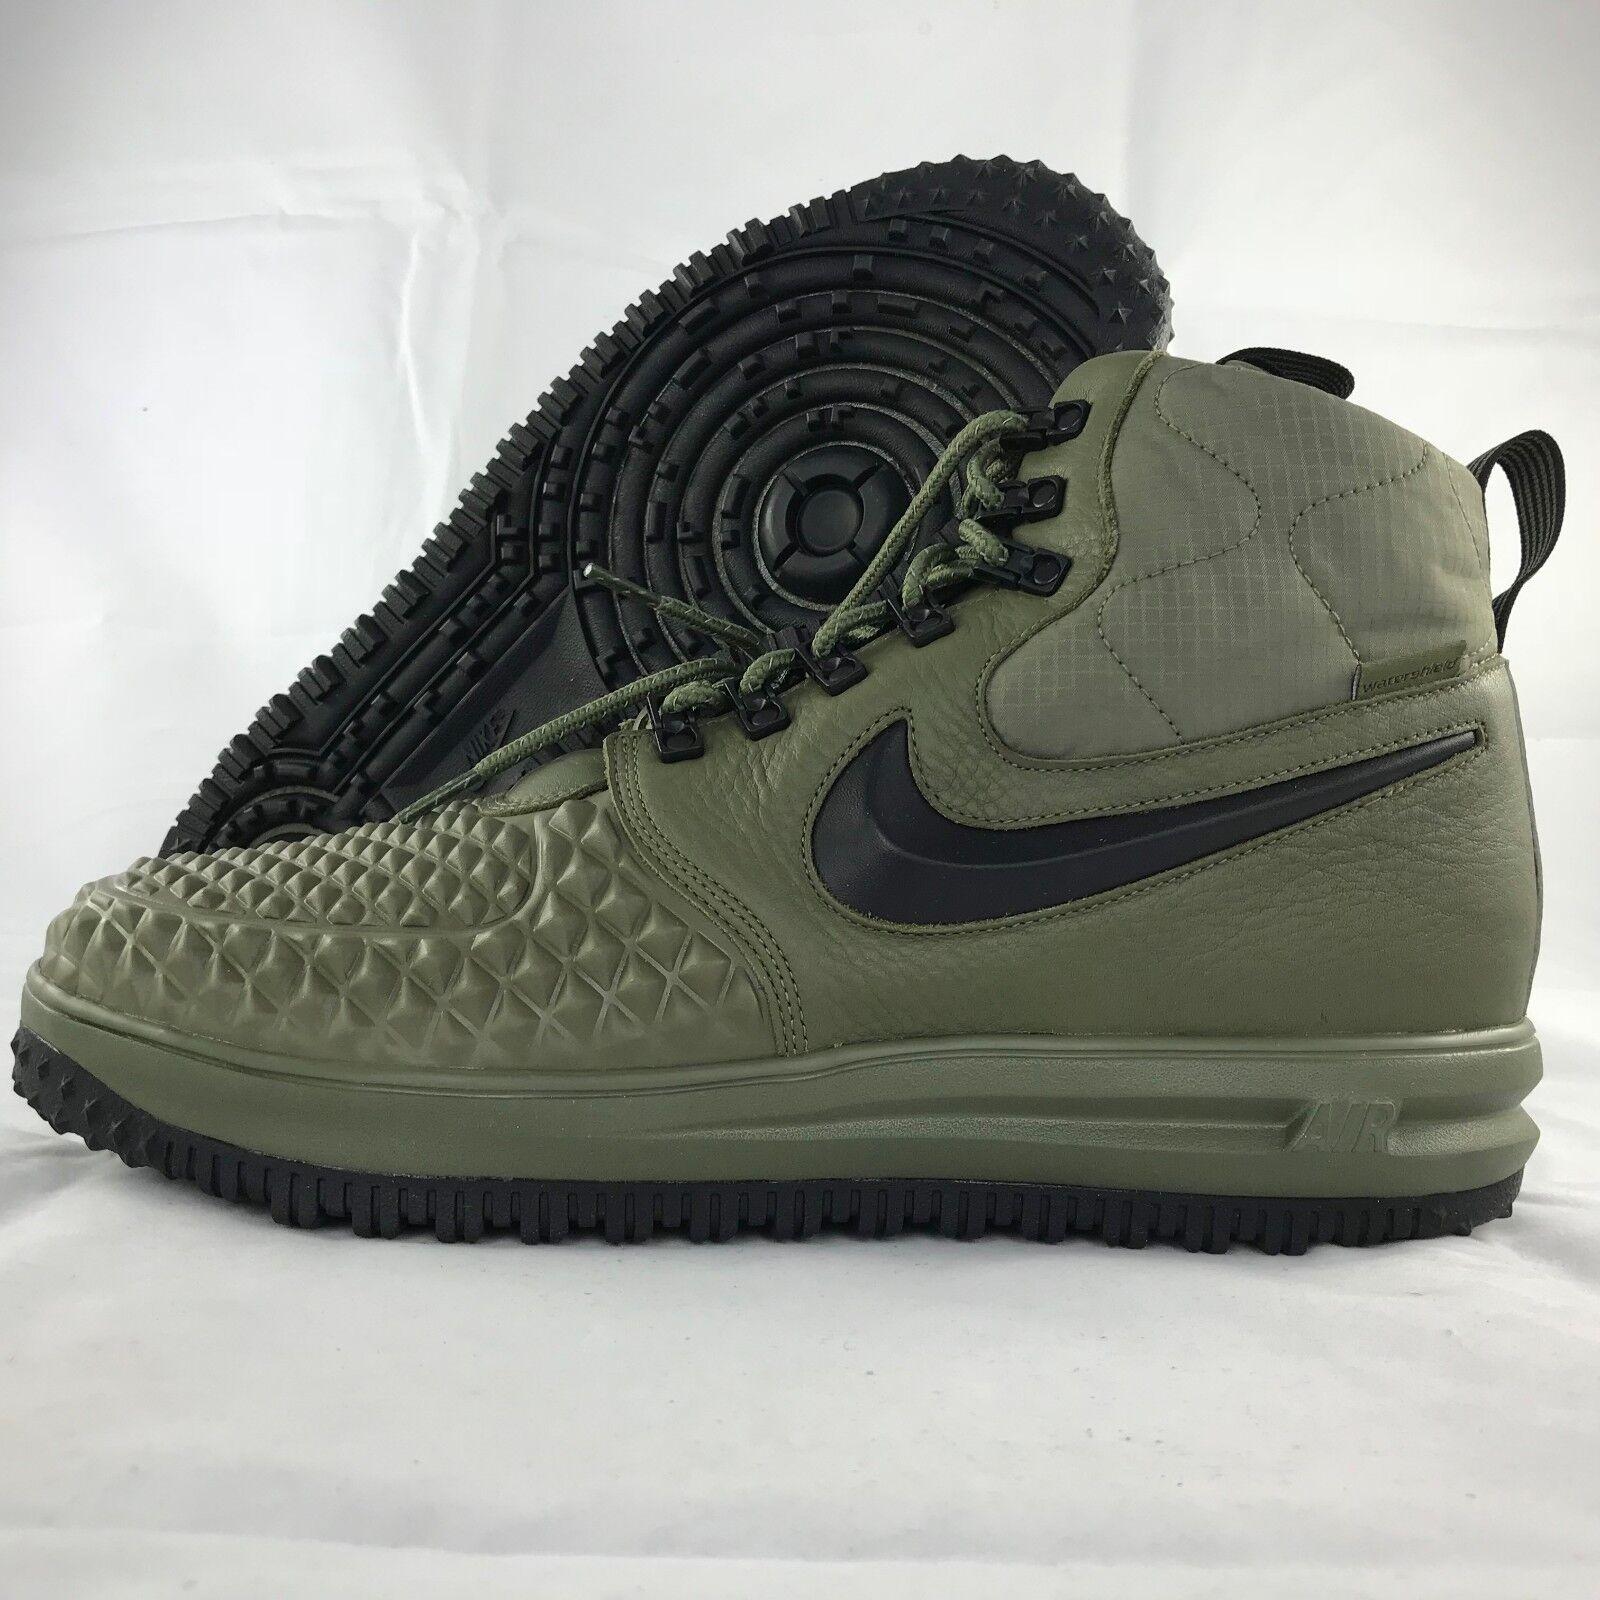 Nike LF1 Duckboot '17 Lunar Force Grey 1 Olive Green Black Grey Force 916682-202 Men's 10.5 0063c1